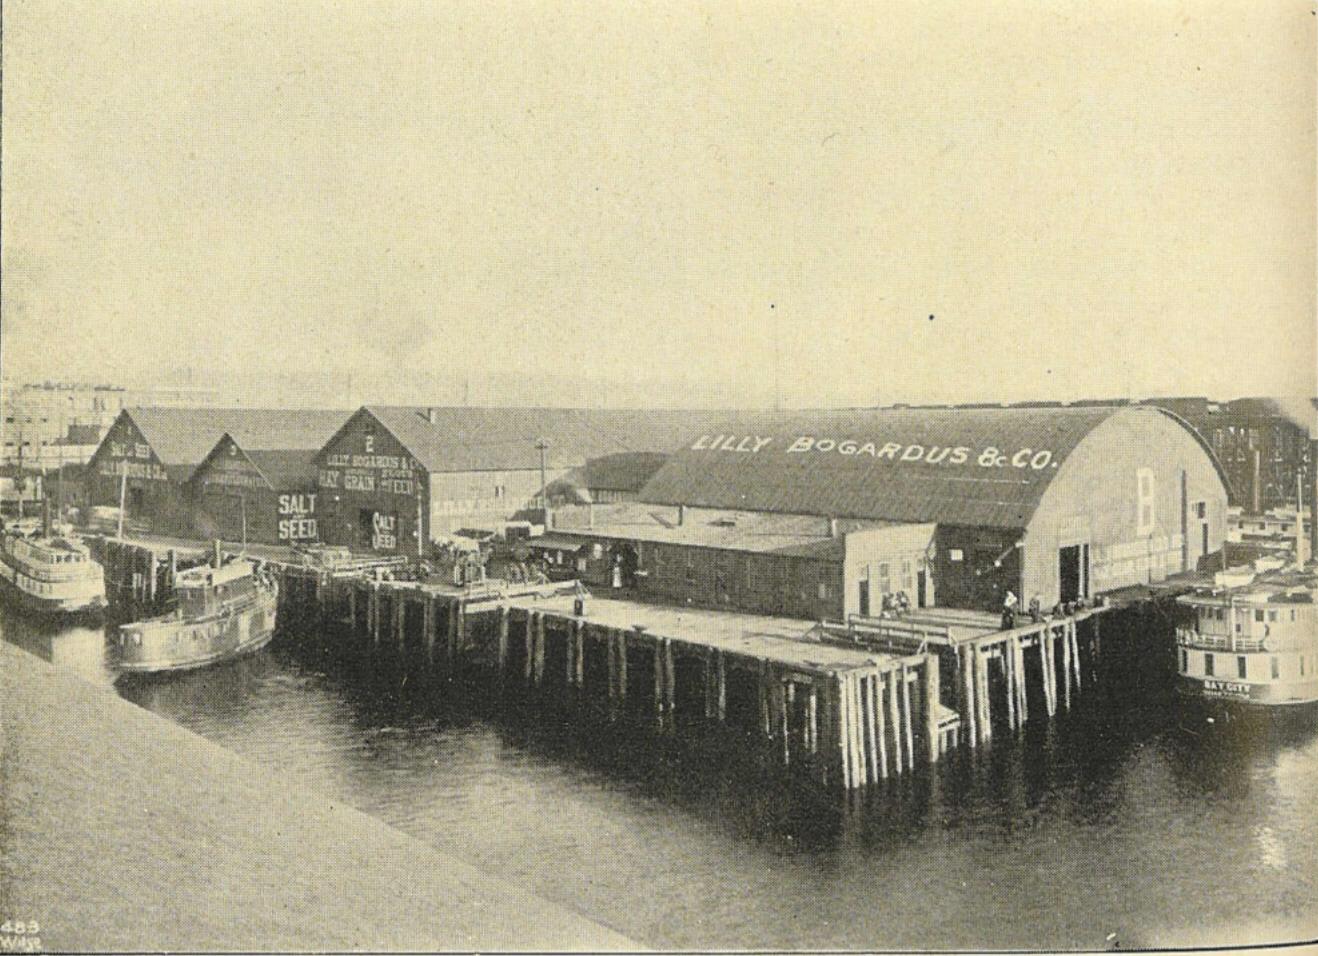 Lilly S Wharf Restaurant